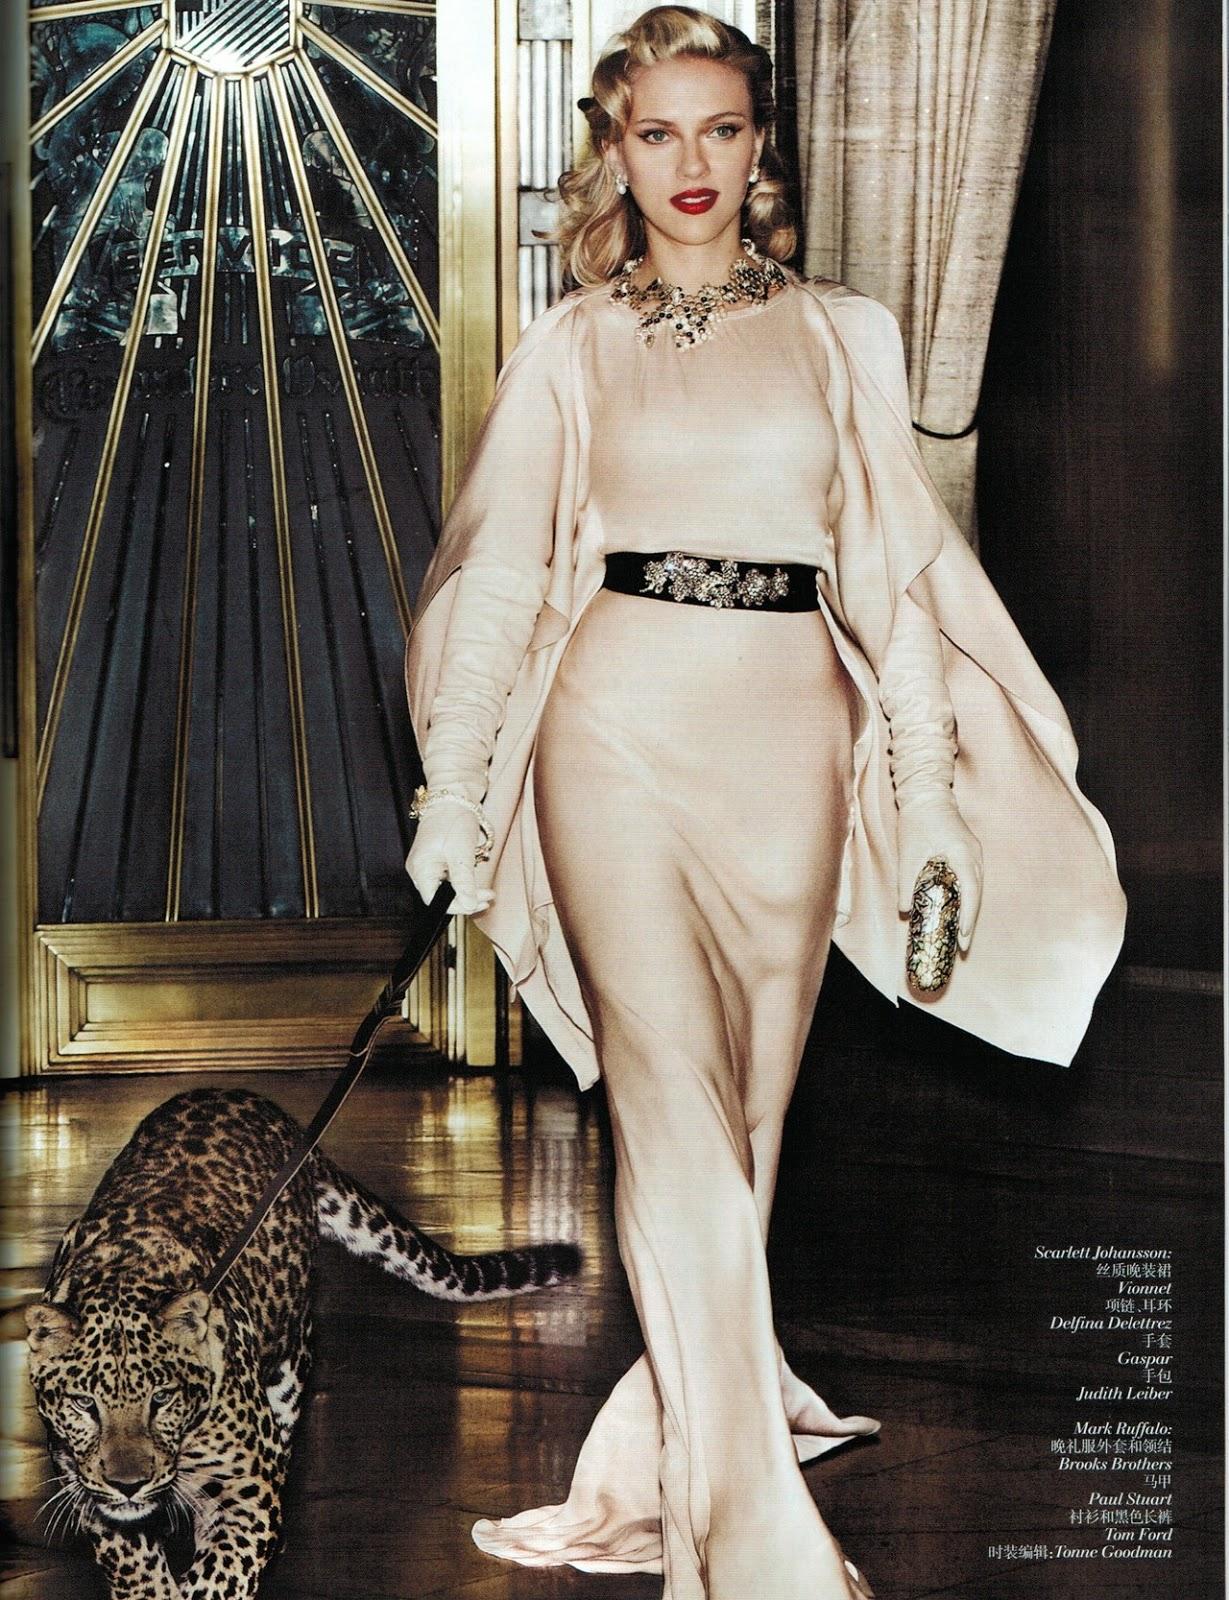 Scarlett Johansson Fashion And Style Part1